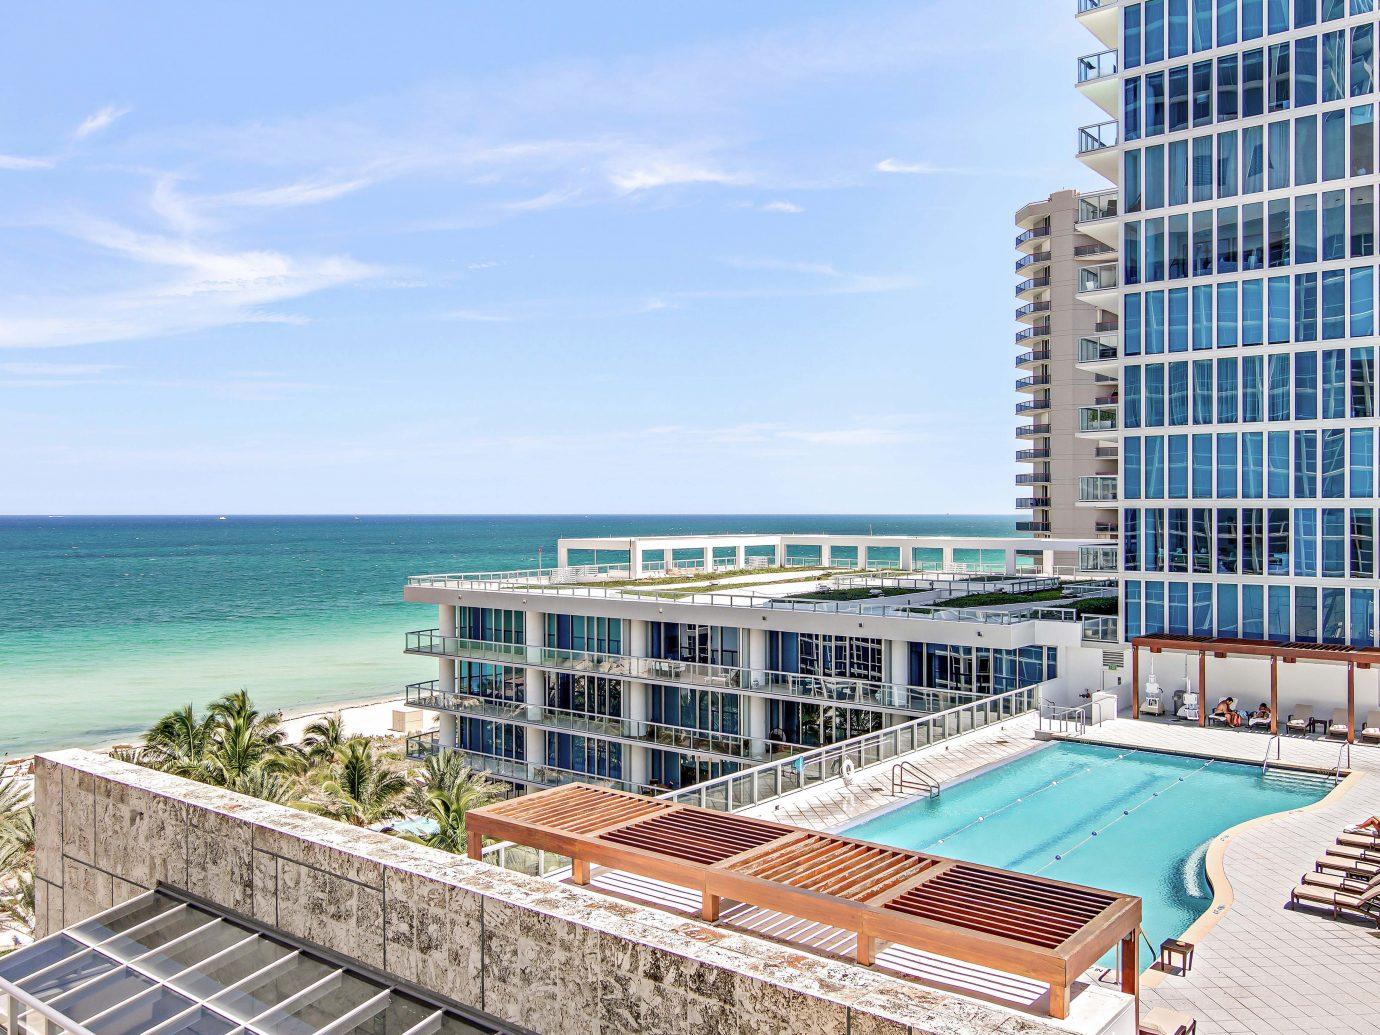 Beach Beachfront City Health + Wellness Hotels Luxury Ocean Romantic Yoga Retreats outdoor condominium property swimming pool Resort real estate facade estate apartment marina dock shore